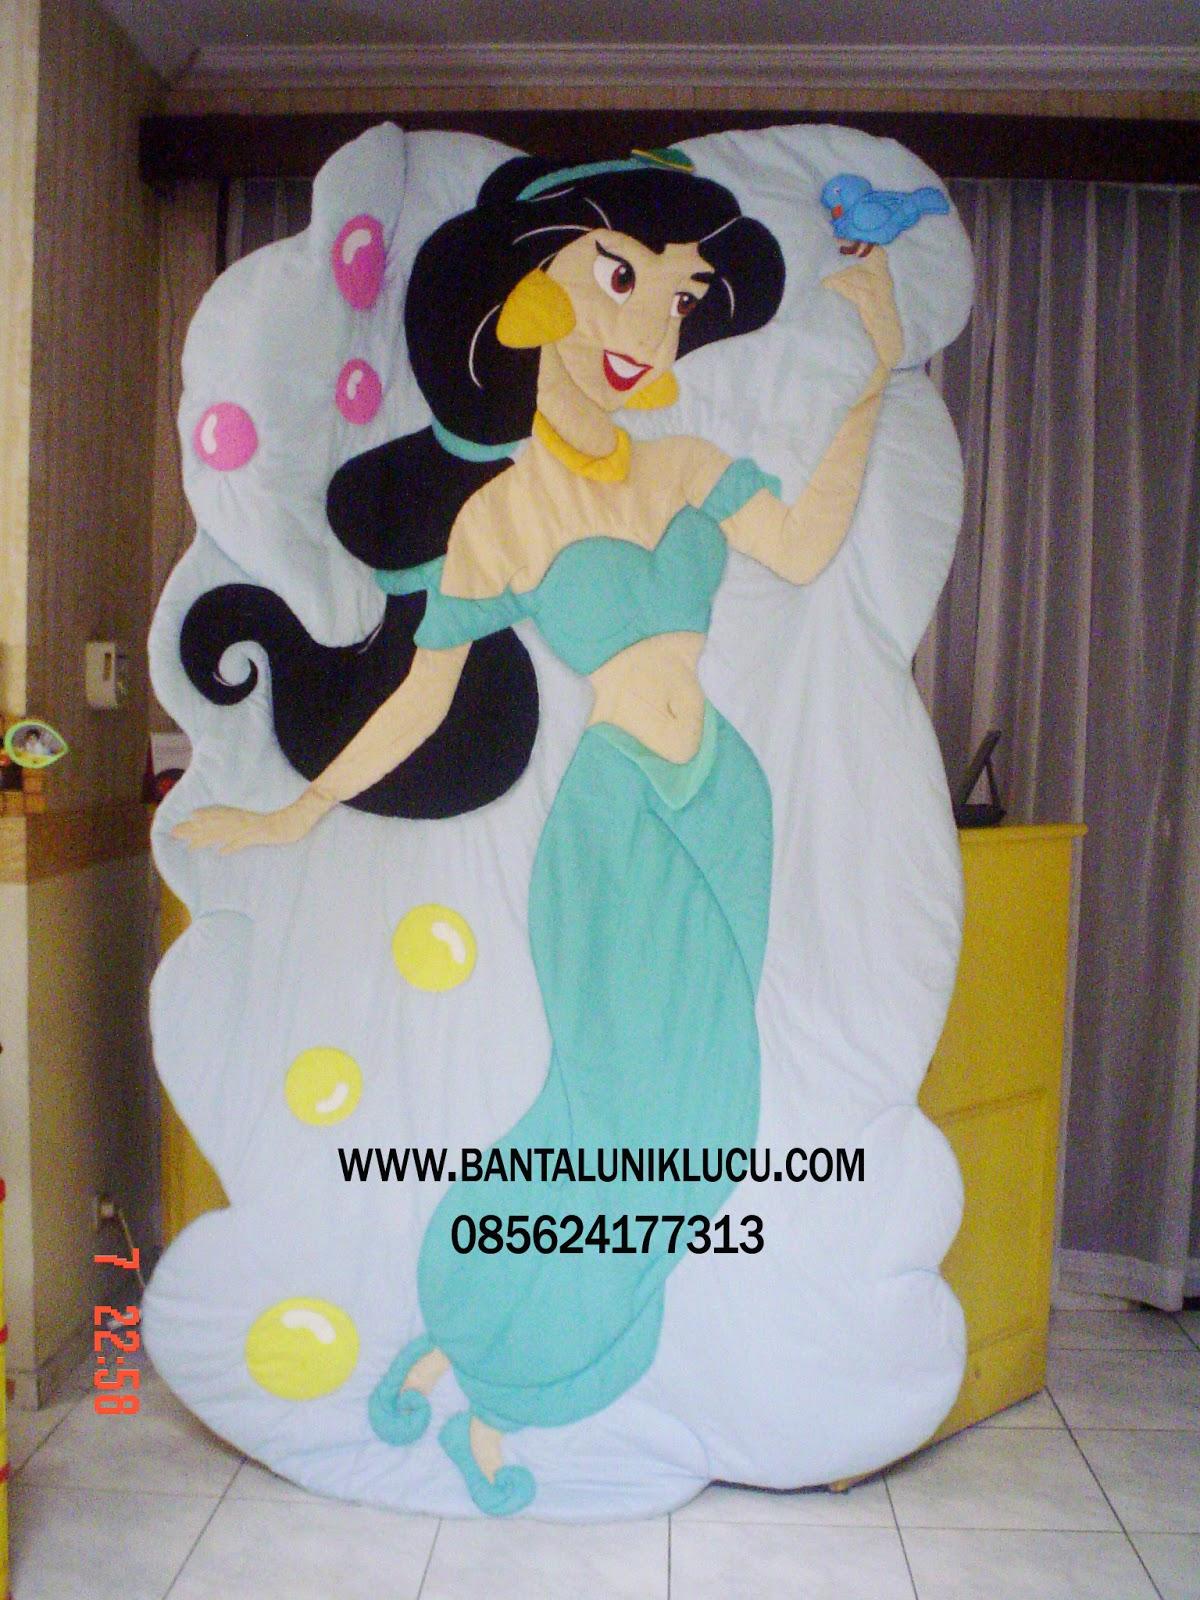 Bed Cover Karakter Jasmine Bantal Unik Lucu